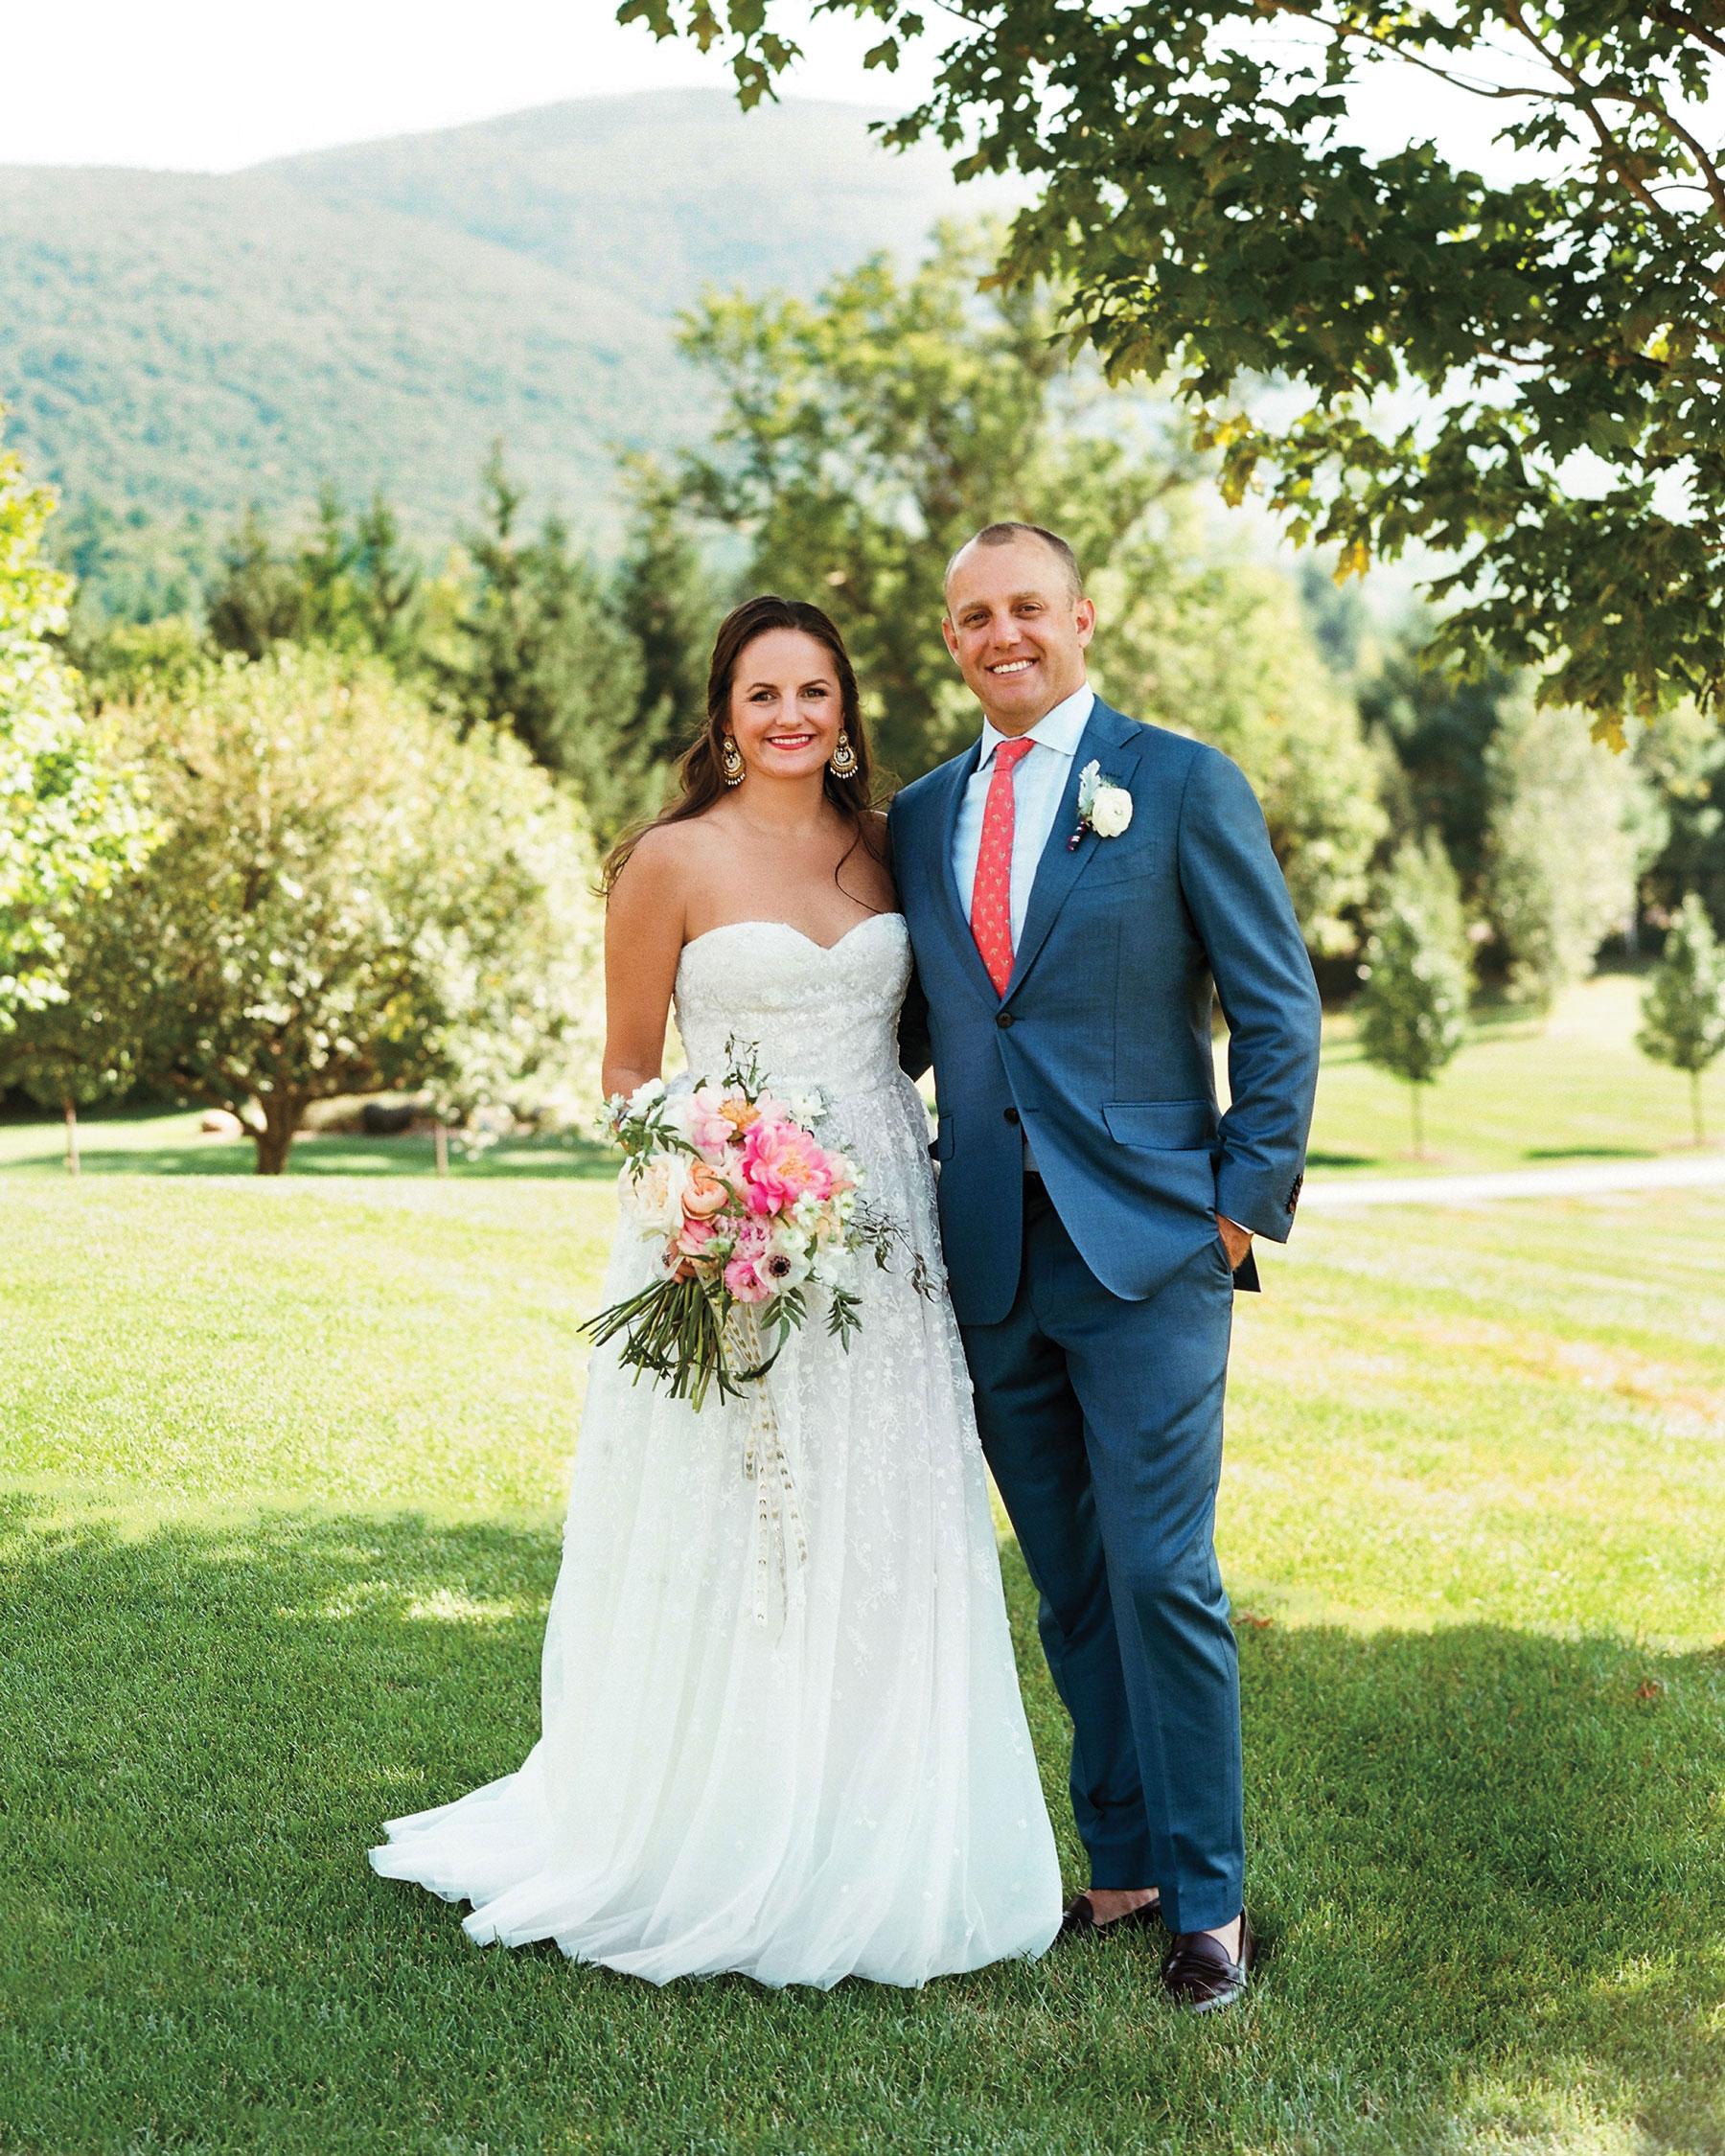 mfiona-peter-wedding-vermont-potraits-9656.12r.2015.47-d112512.jpg